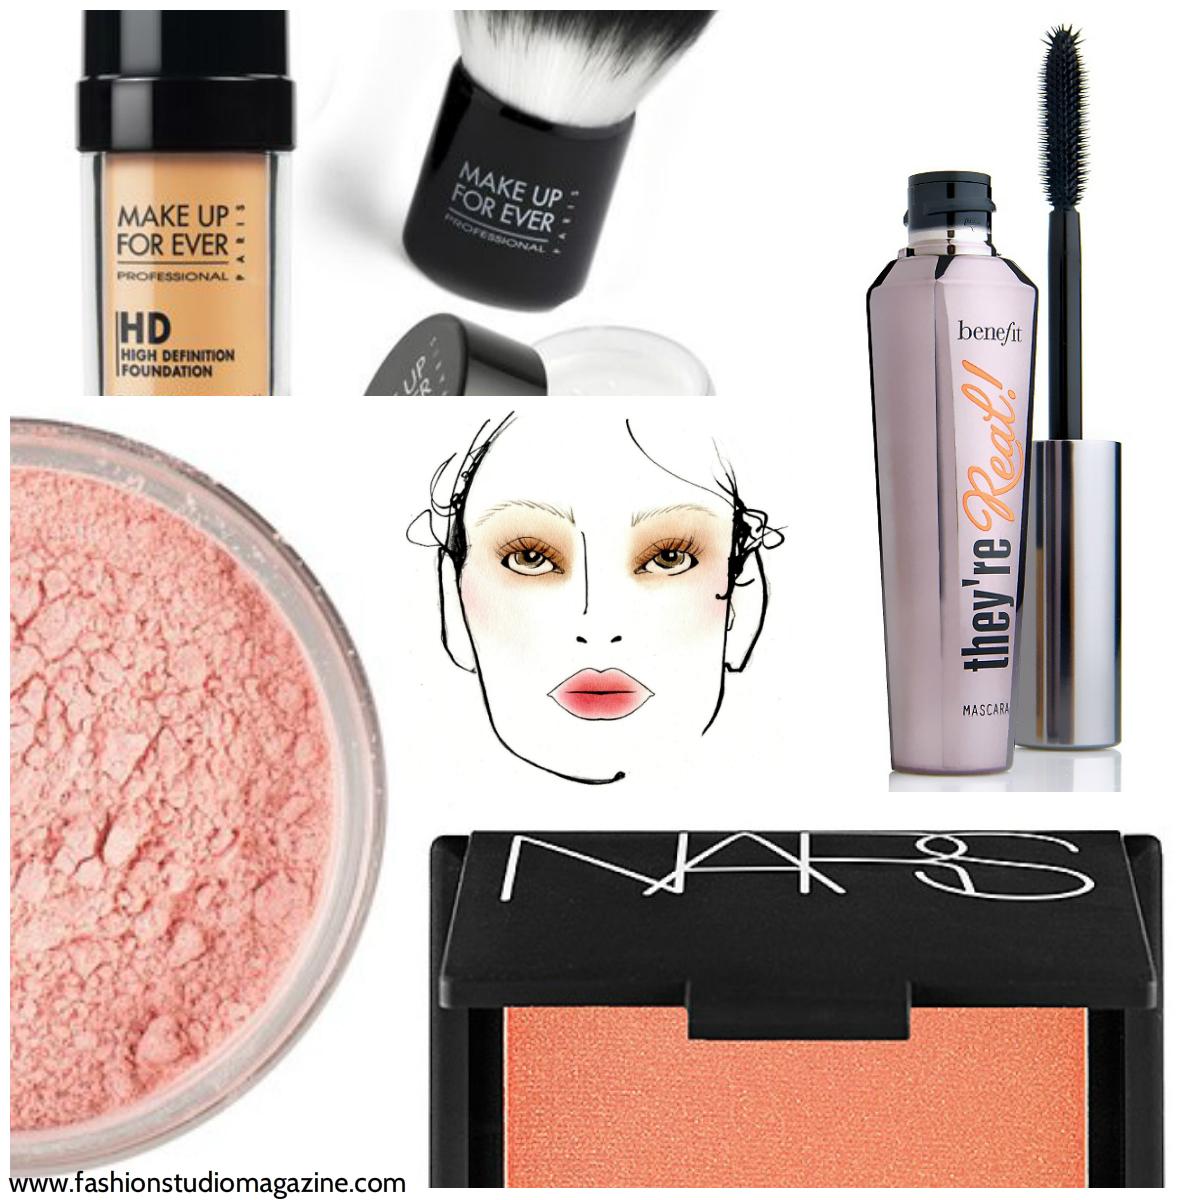 fashion studio magazine: makeup tips